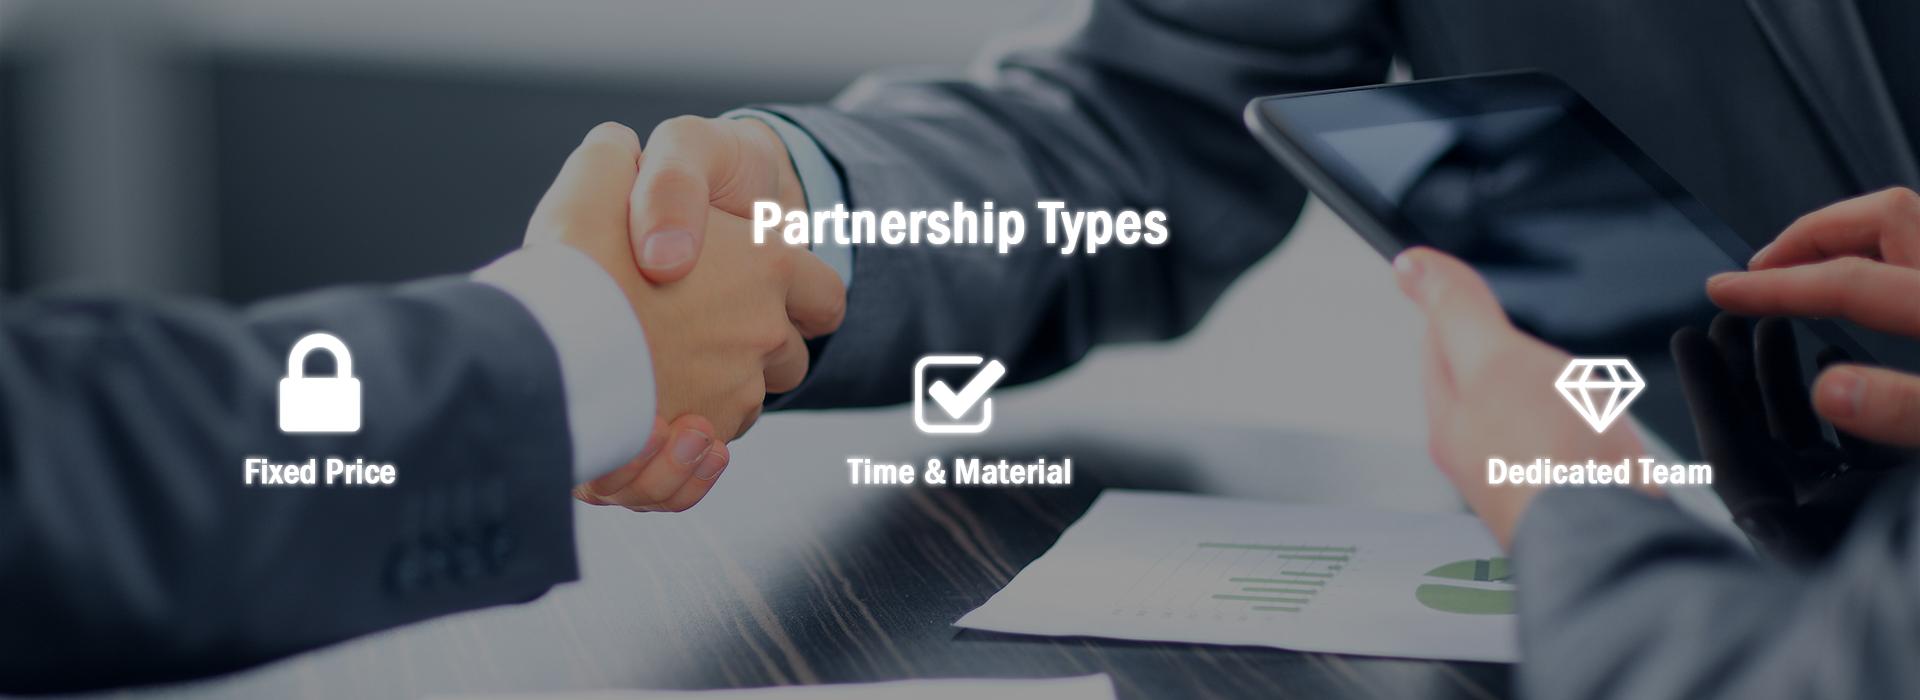 Partnership types